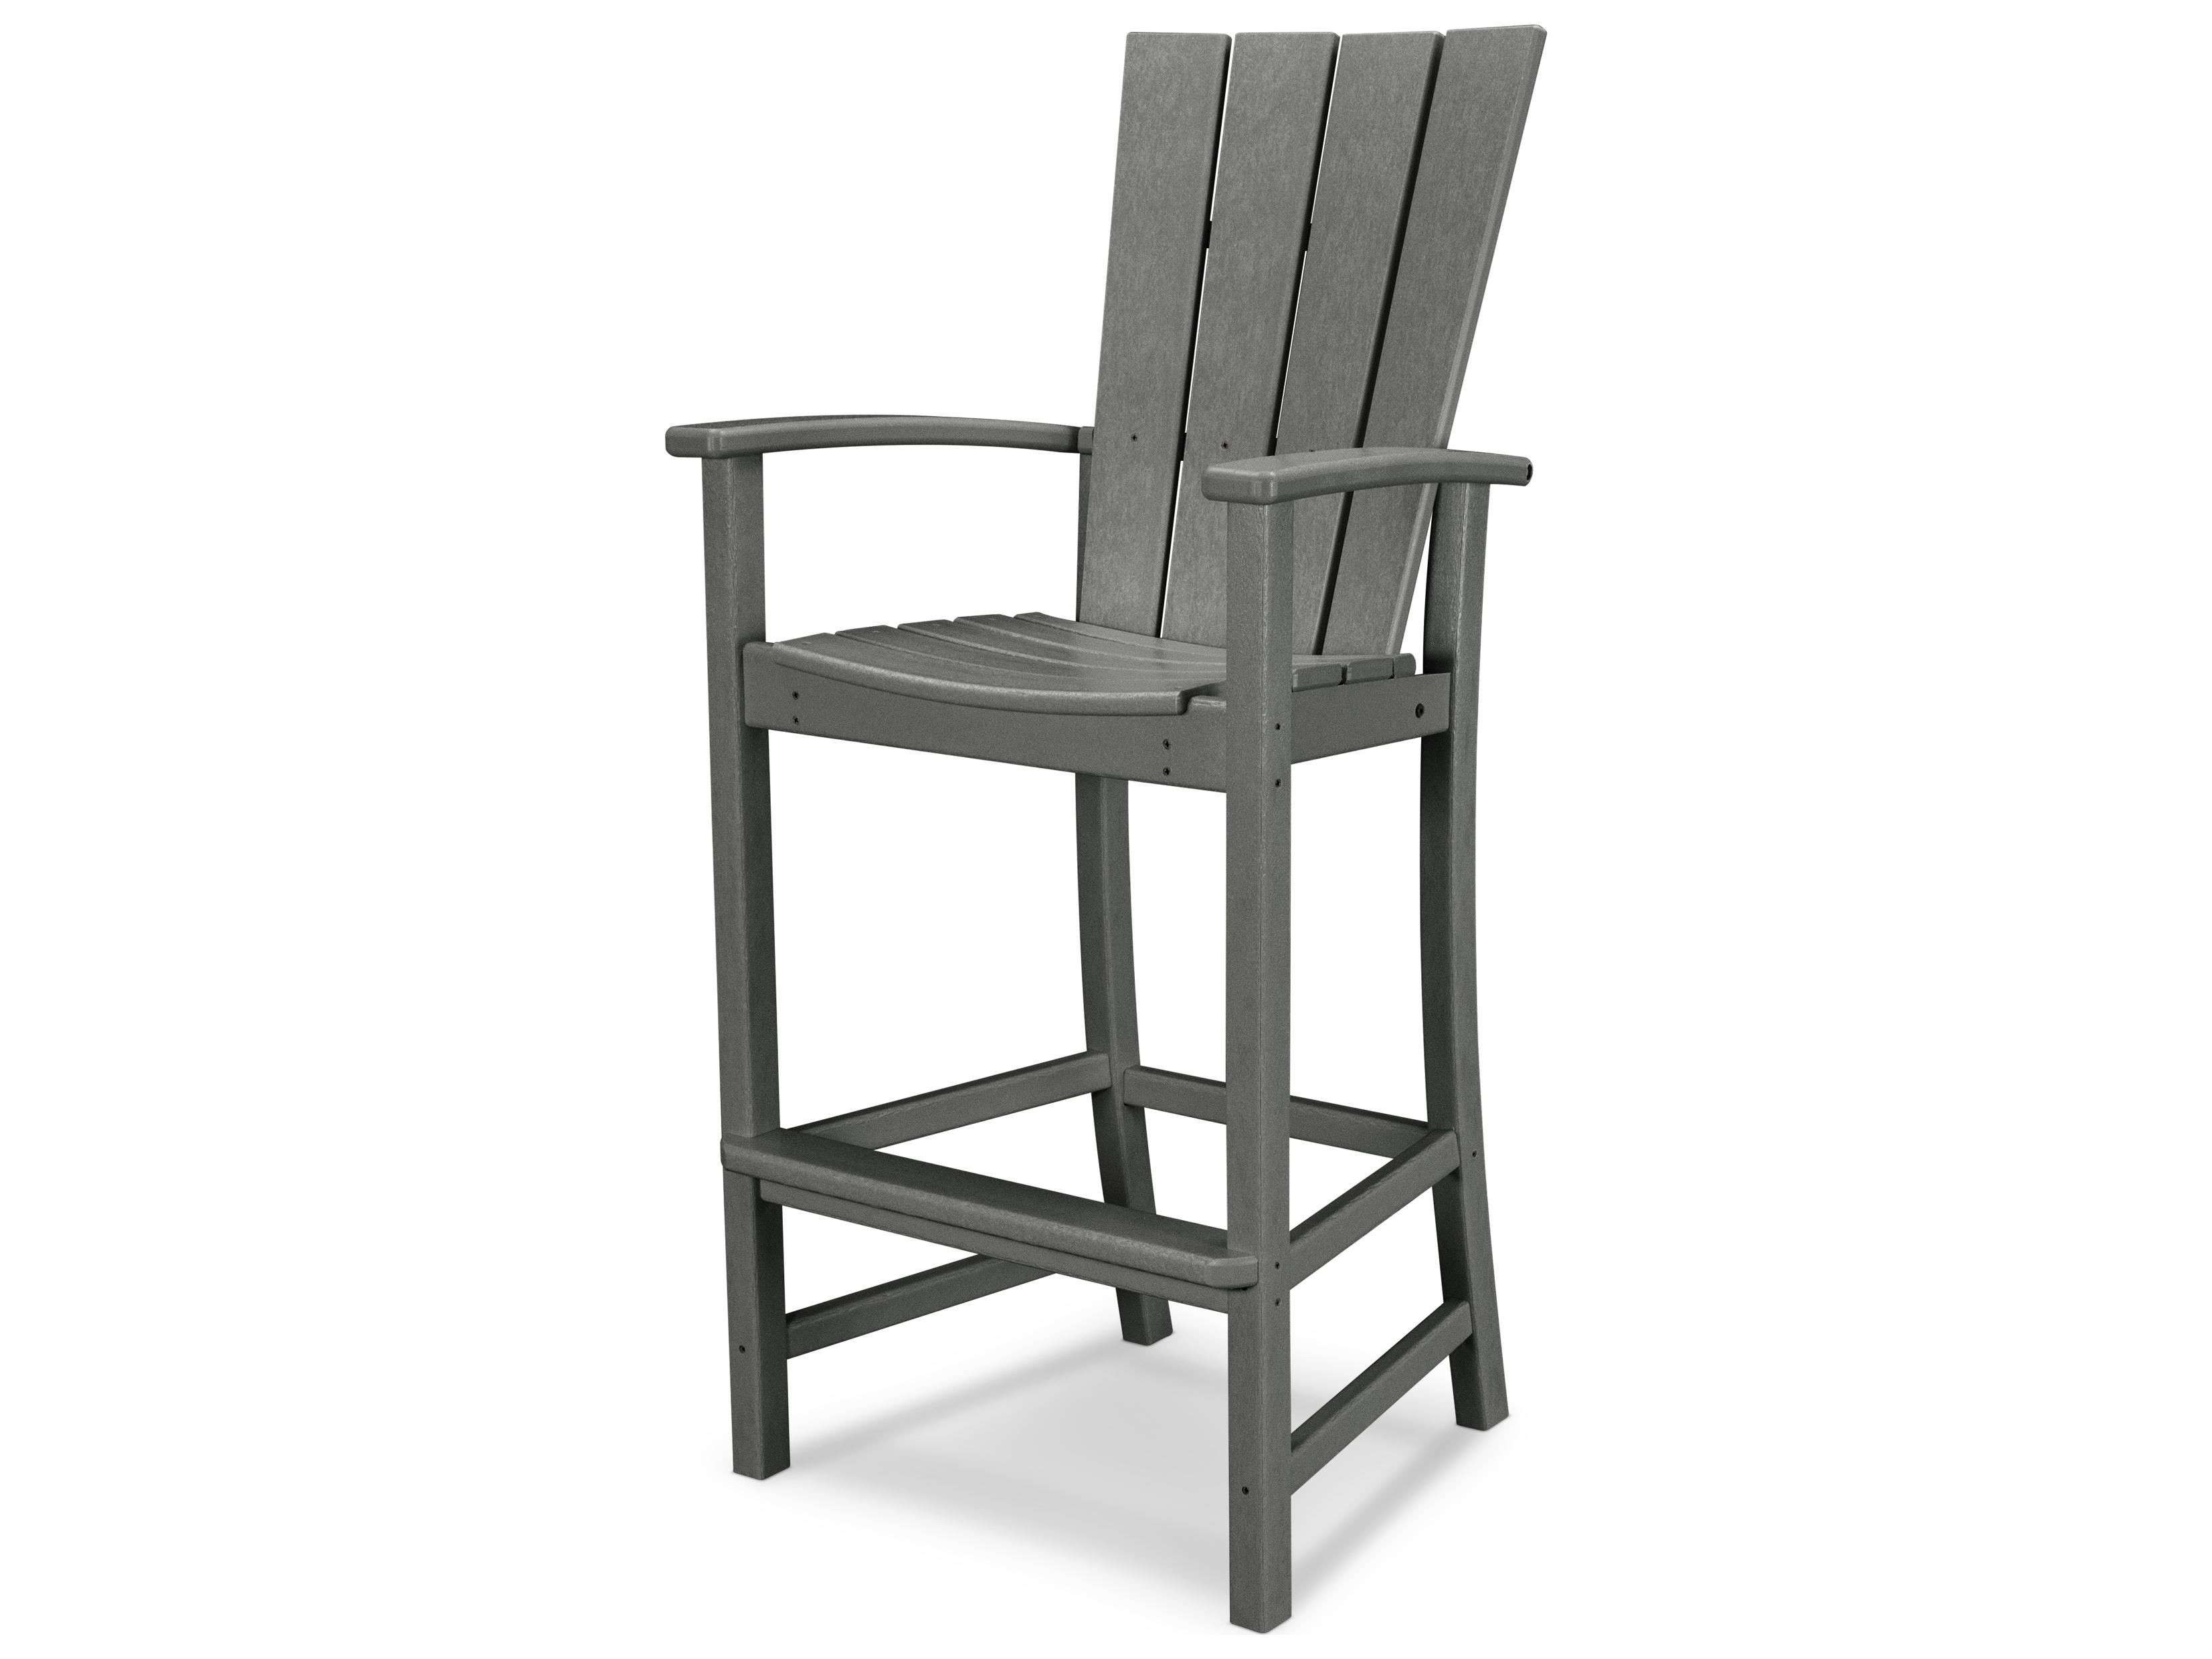 Polywood quattro recycled plastic adirondack bar chair - Chaise adirondack plastique recycle costco ...